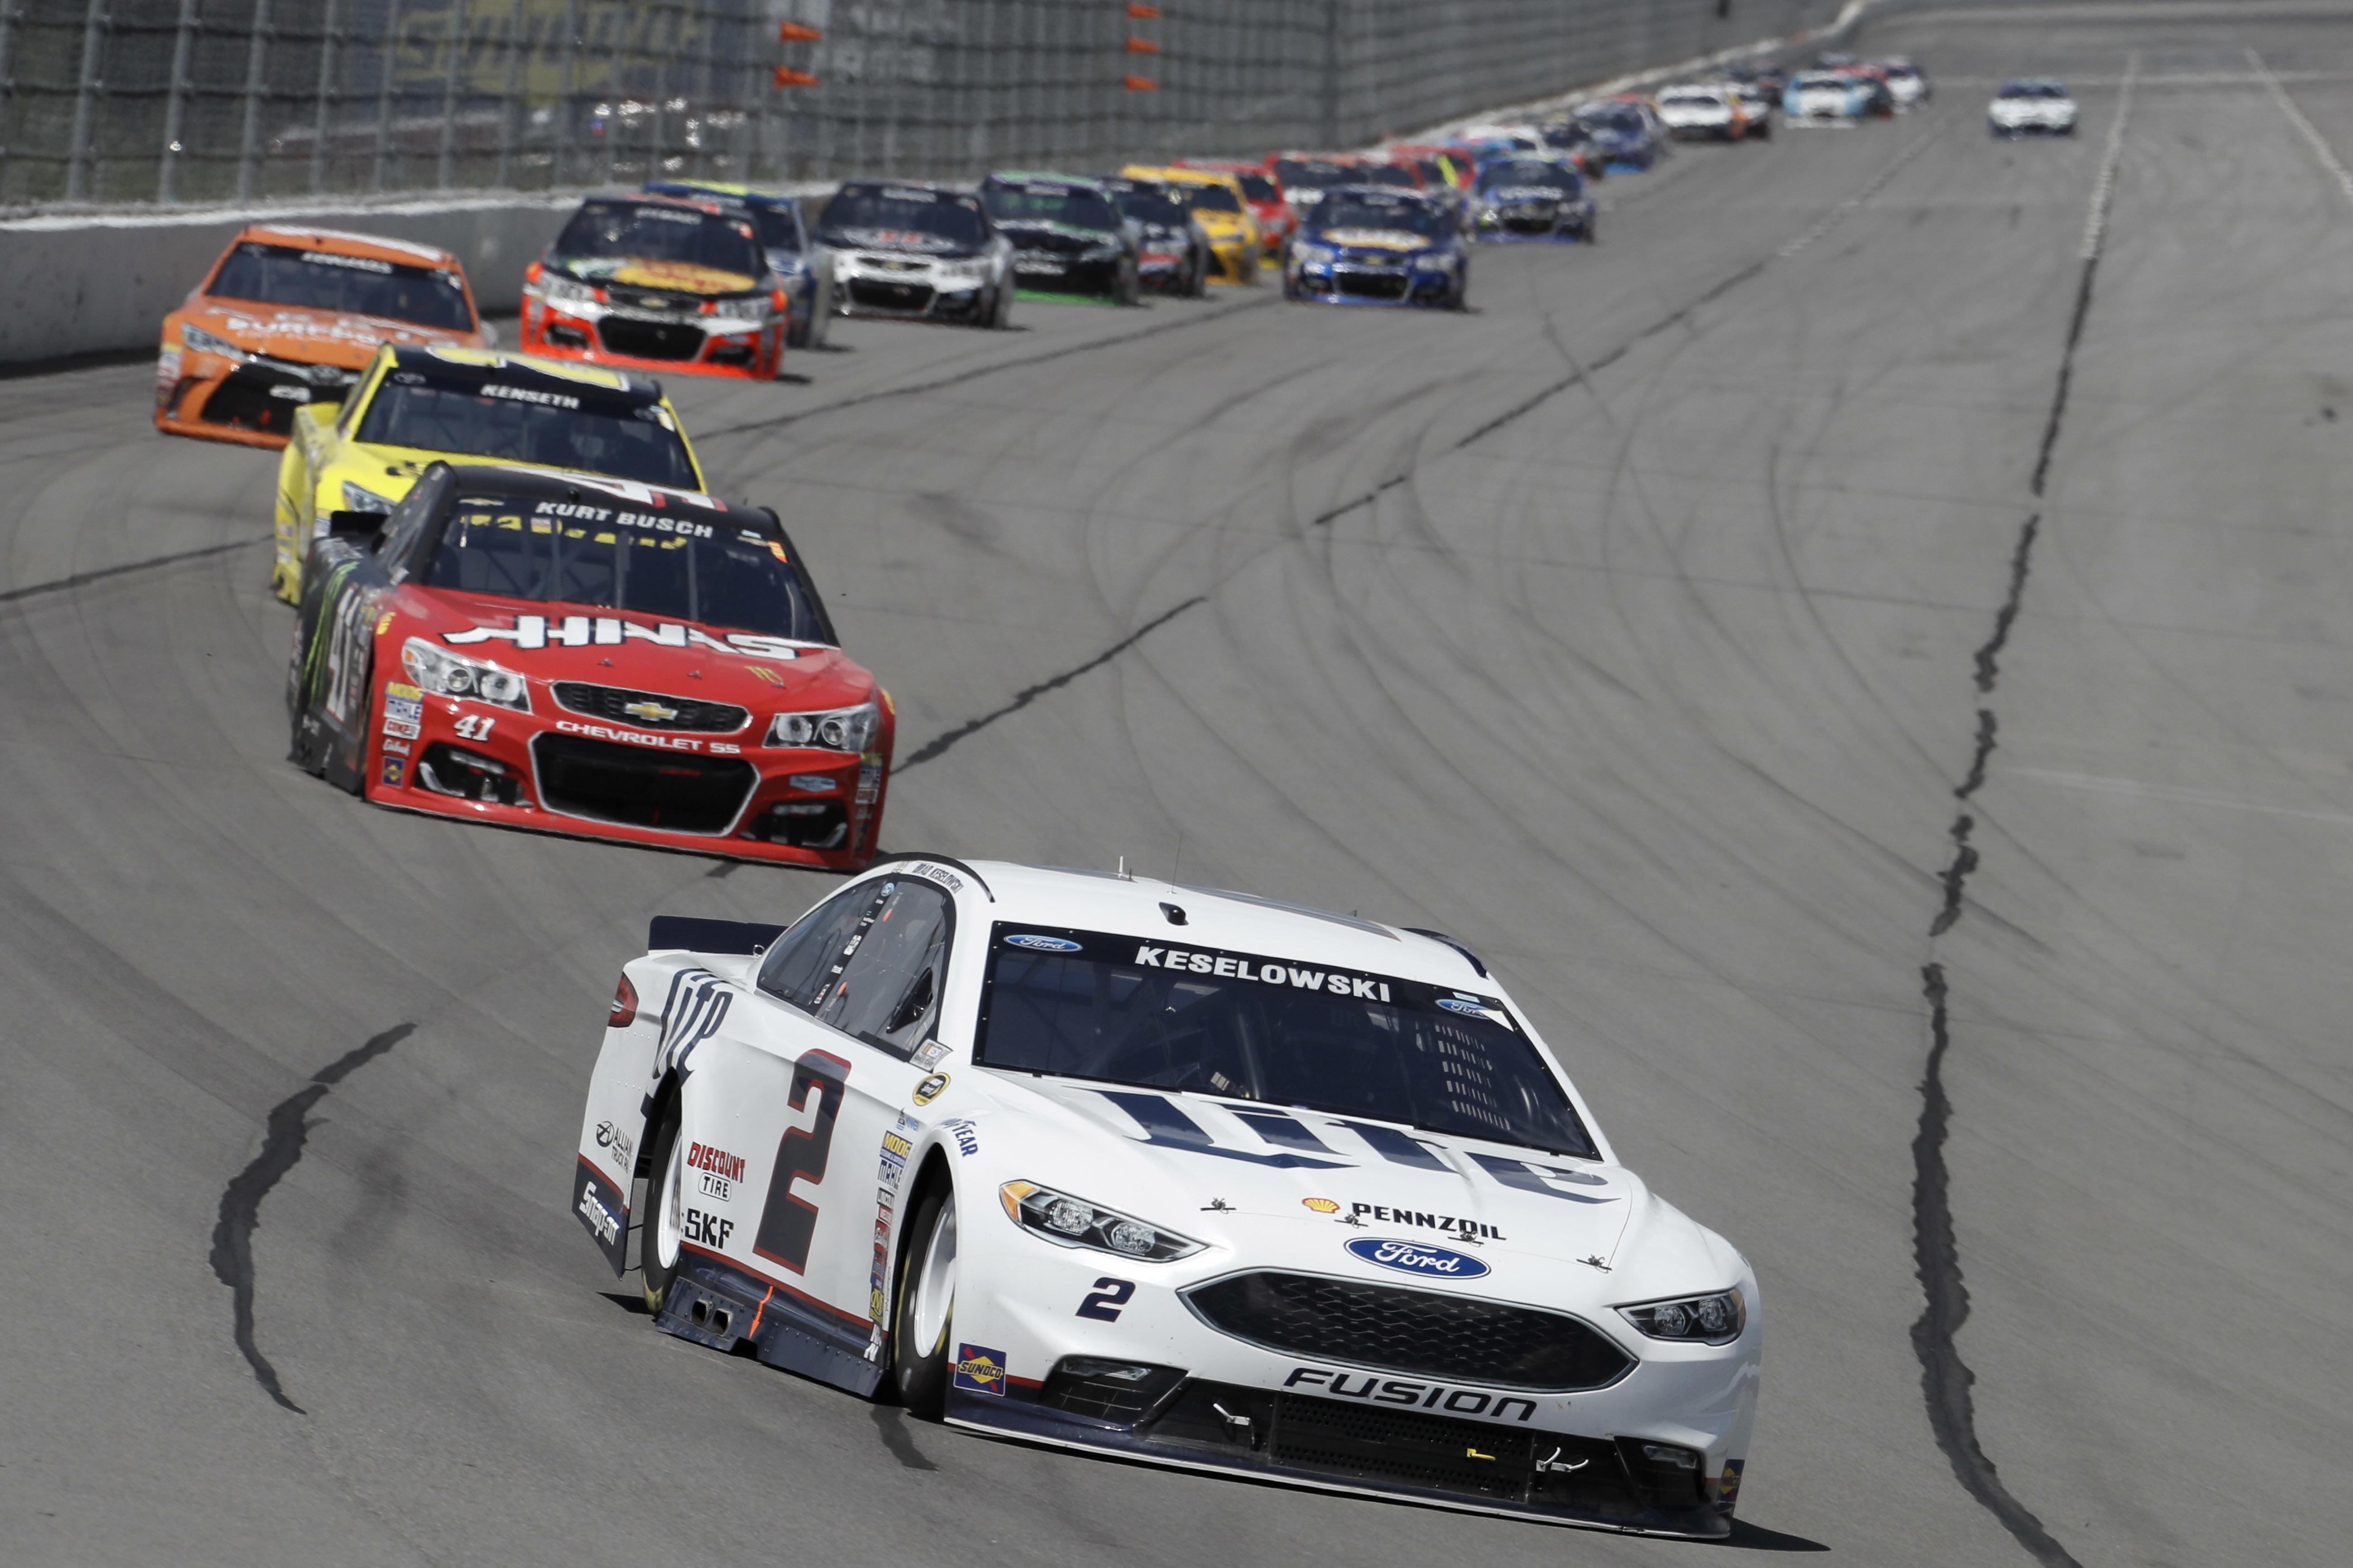 Brad Keselowski drives into Turn 1 during the NASCAR Sprint Cup series auto race at Pocono Raceway, Monday, June 6, 2016, in Long Pond, Pa. (AP Photo/Matt Slocum)